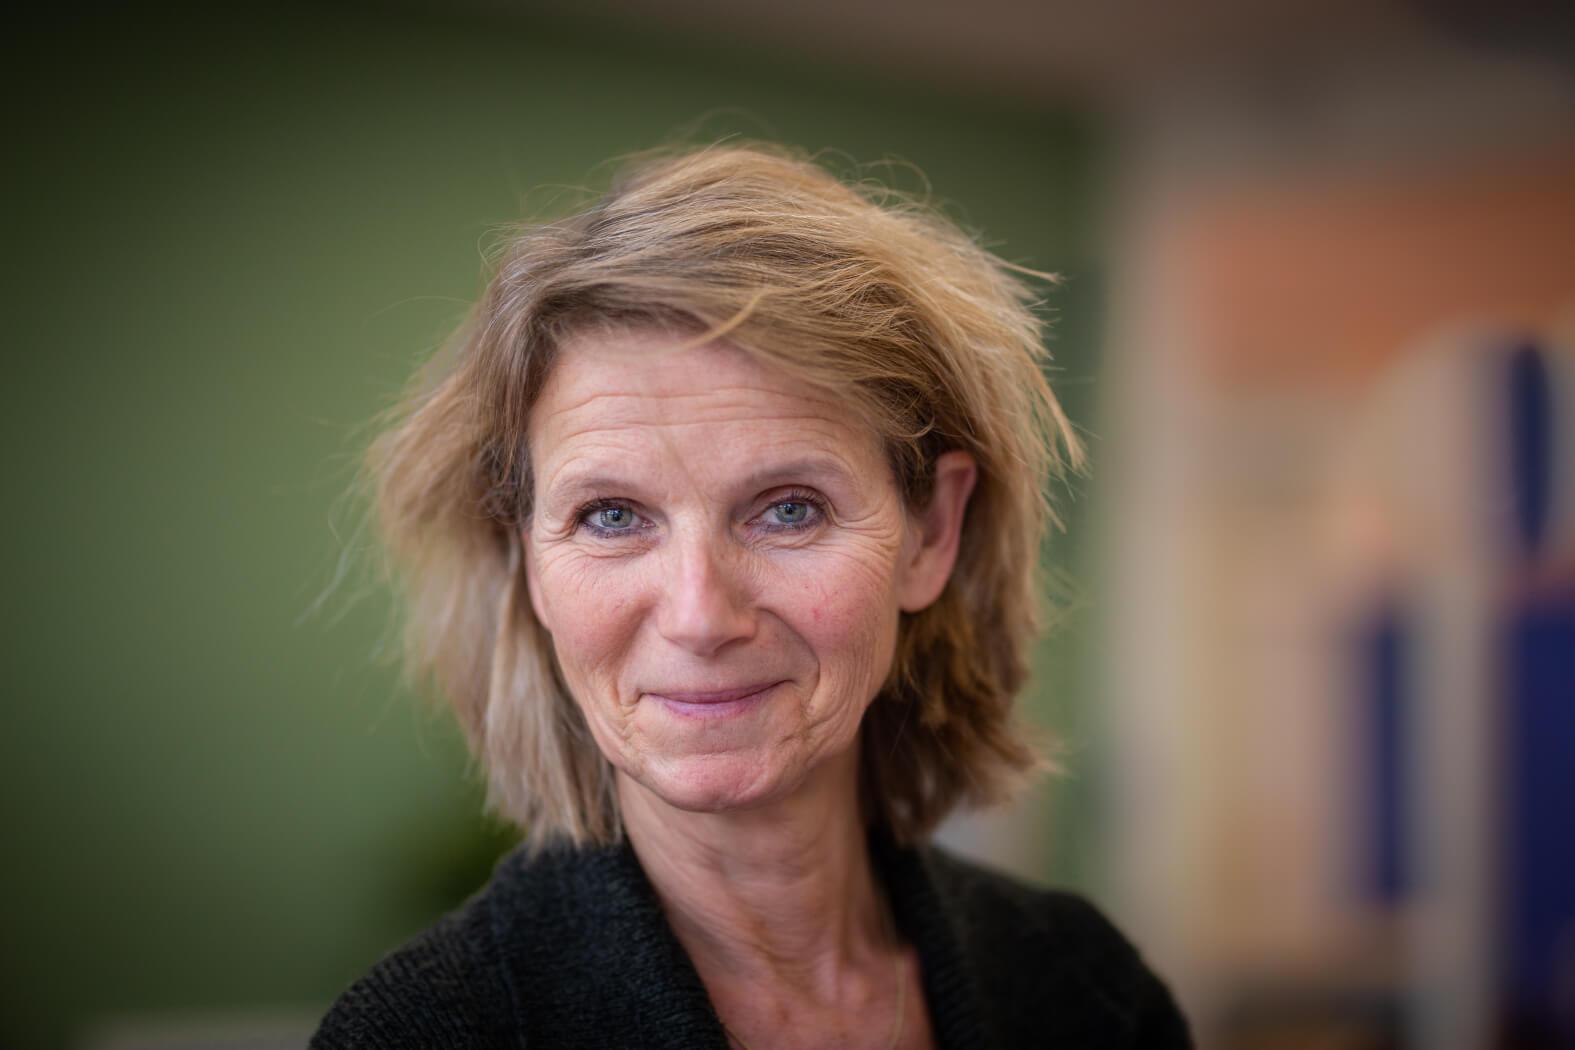 Monique Karsten